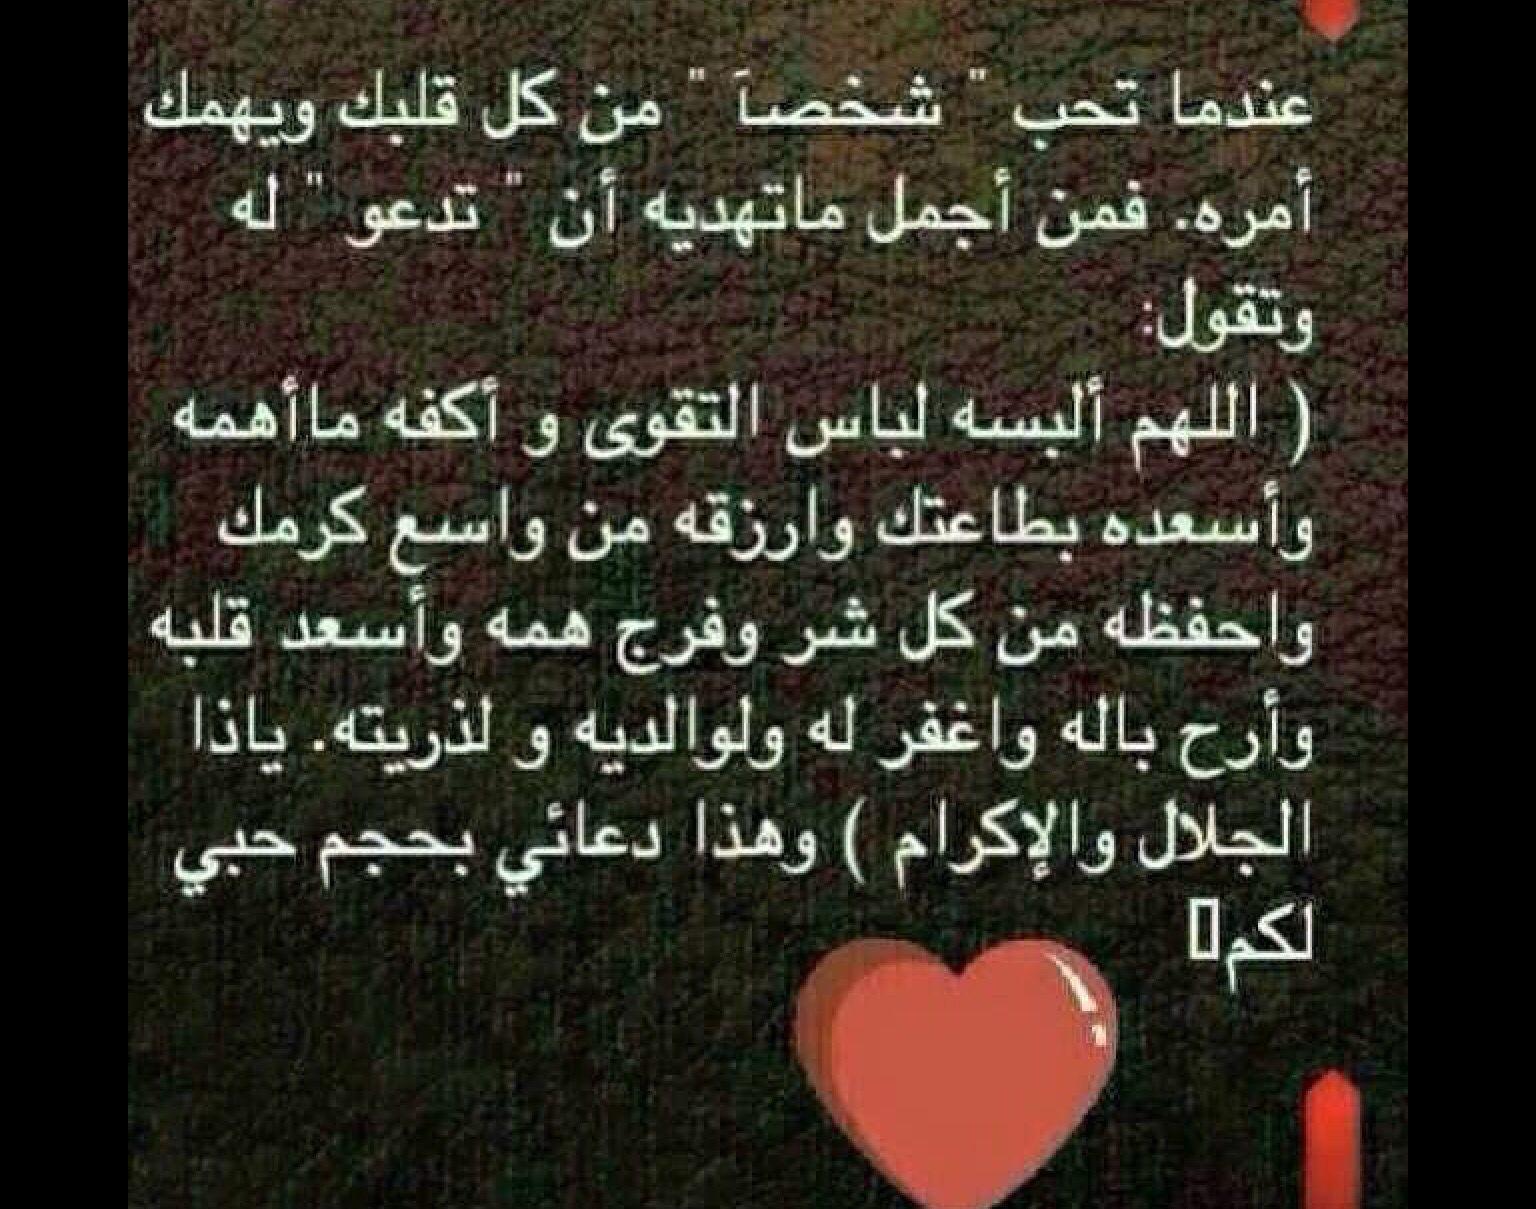 Pin By Hala Alhashmi On دعاء لمن أراد الدعاء Little Prayer Arabic Quotes Islam